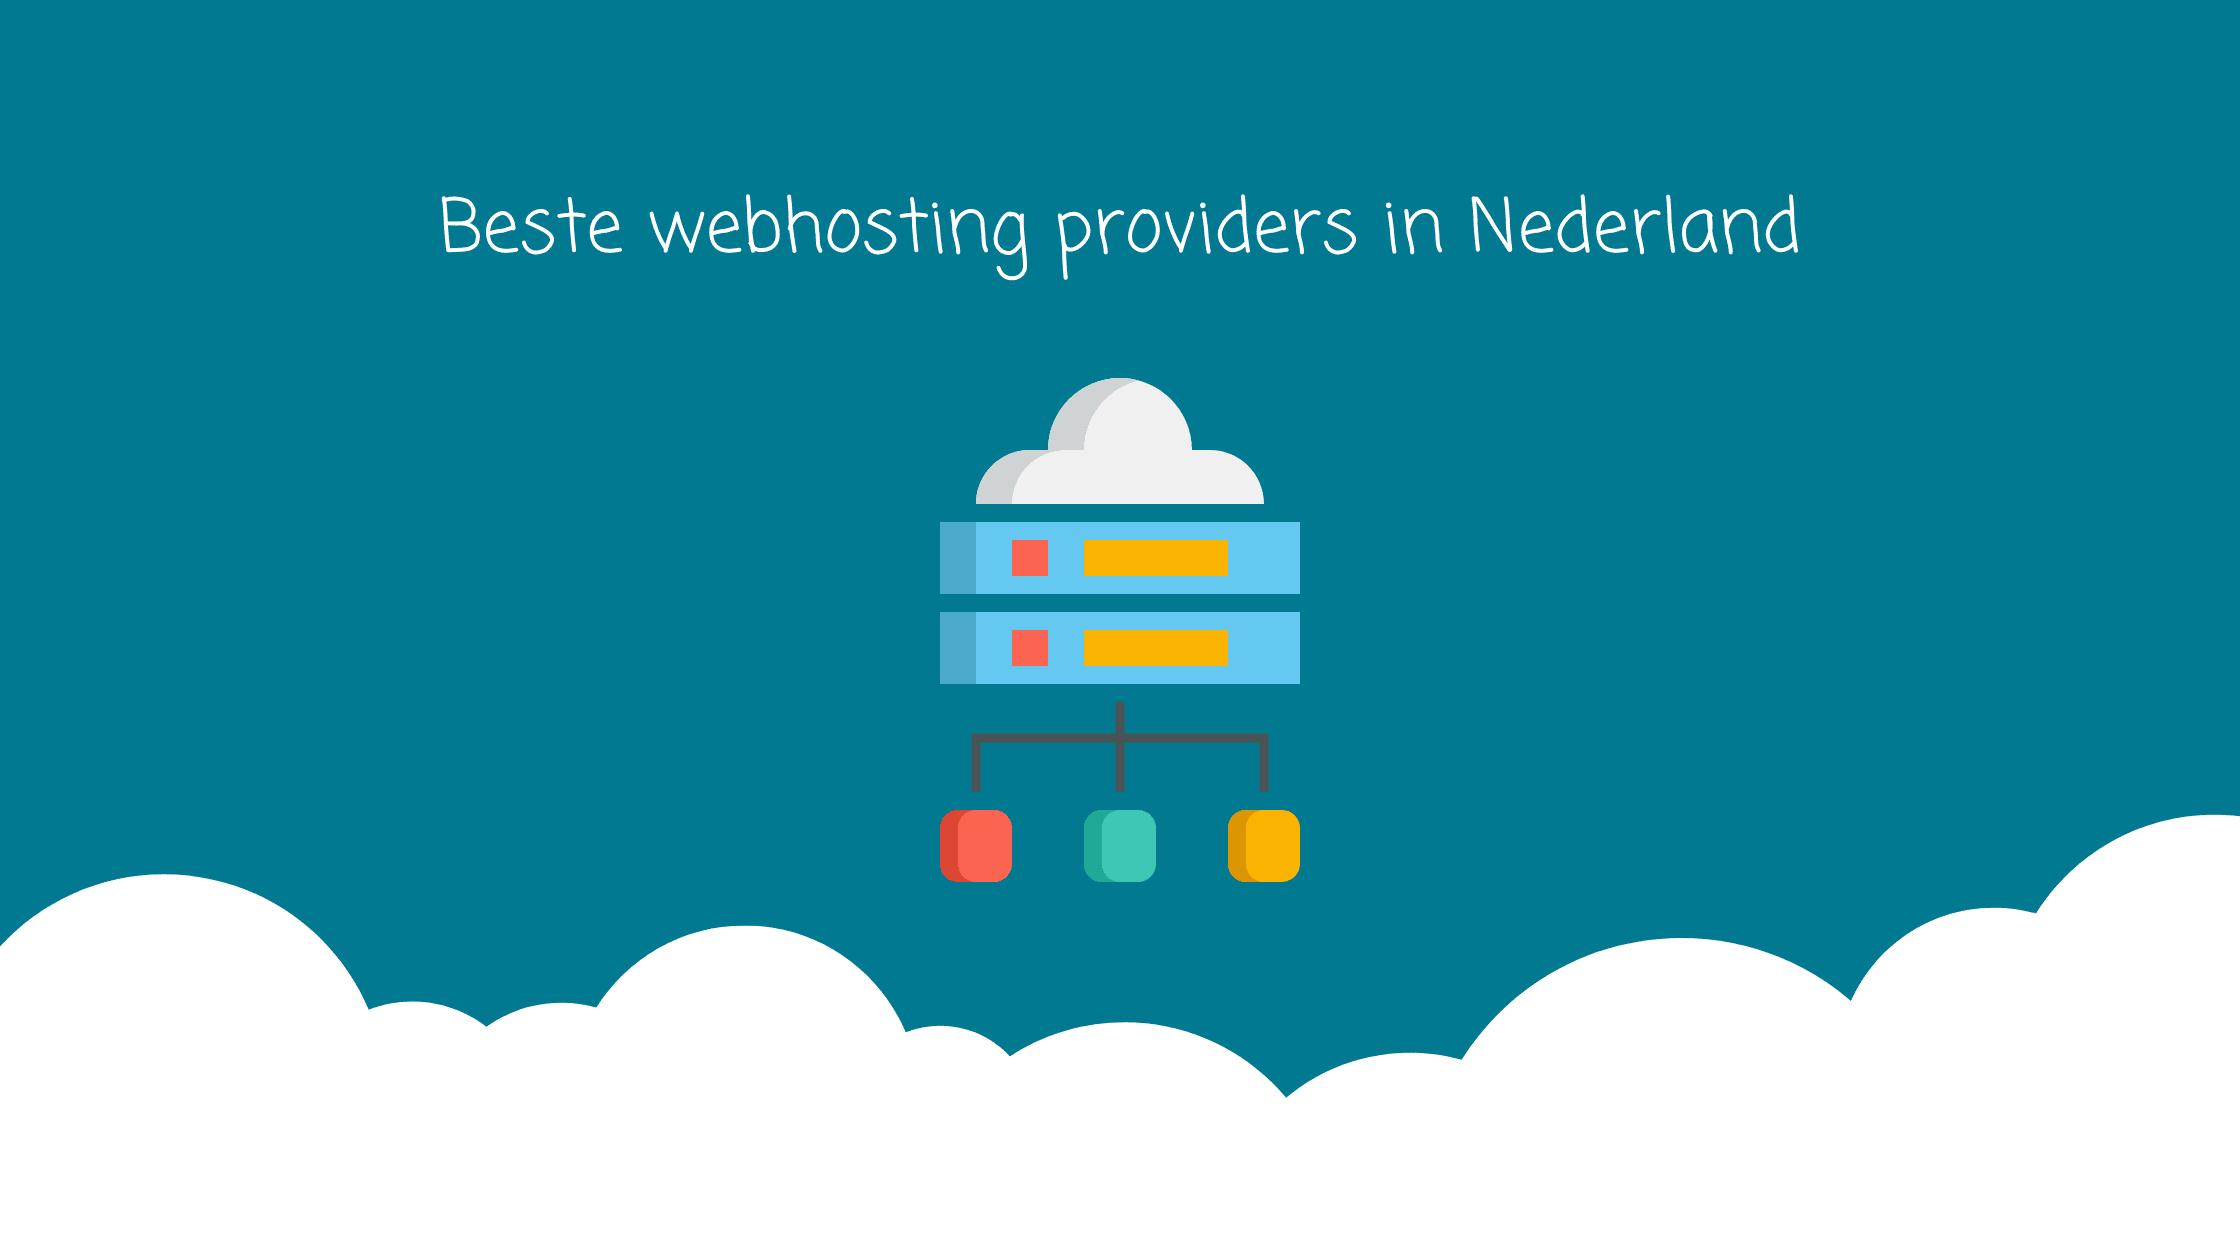 Beste-webhosting-providers-in-nederland